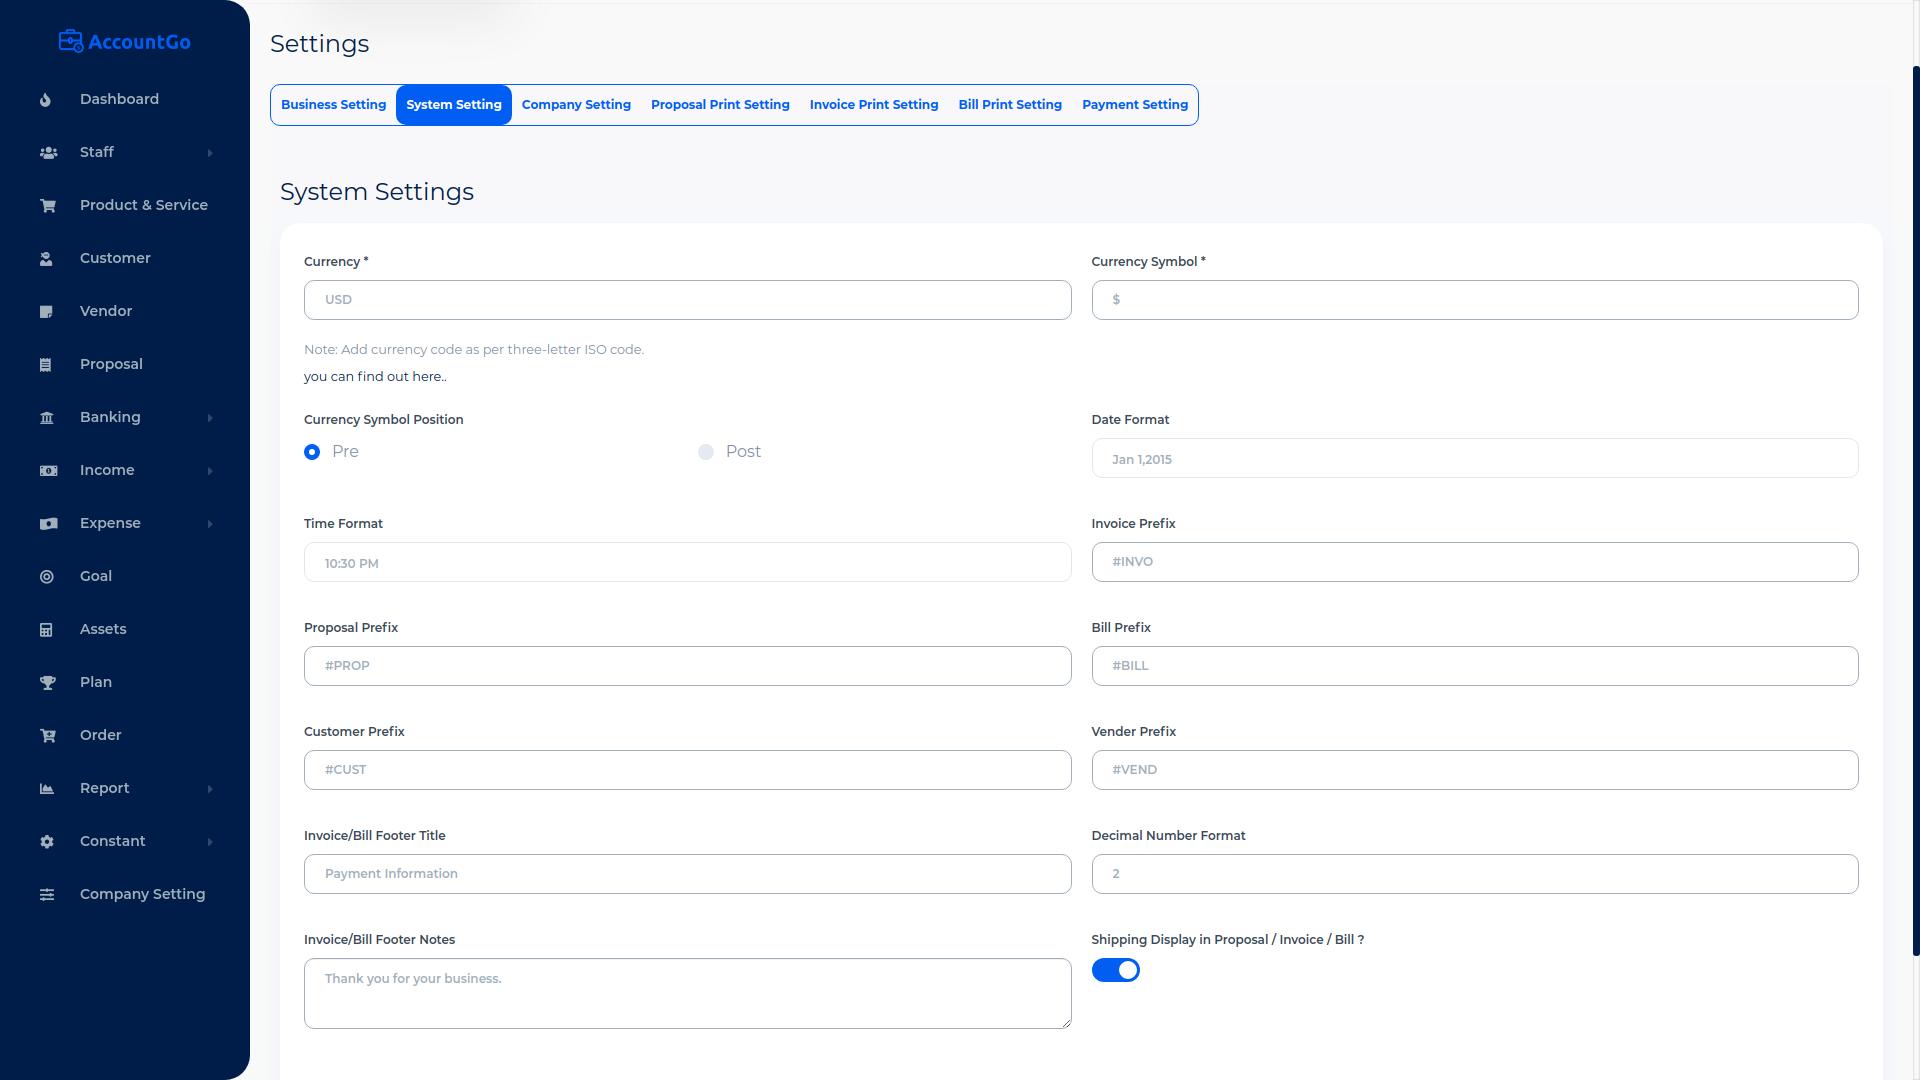 AccountGo SaaS - Accounting and Billing Tool - 15